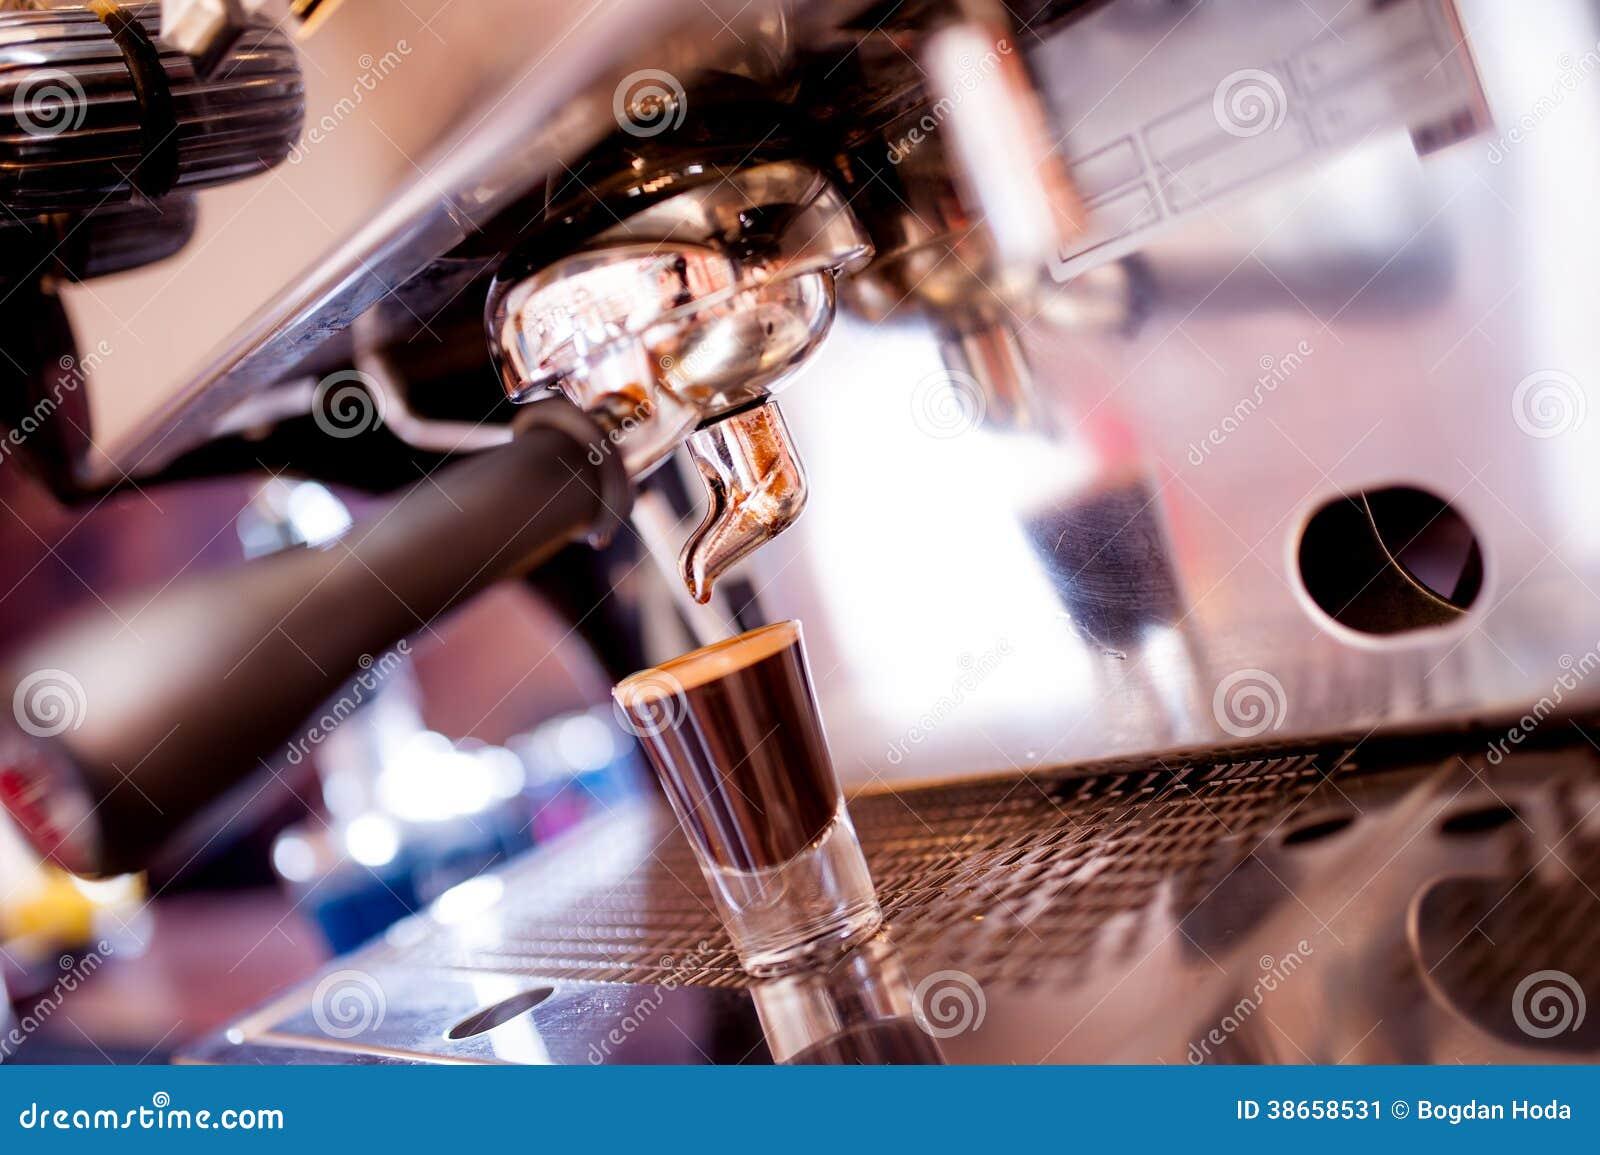 Espresso machine making special coffee